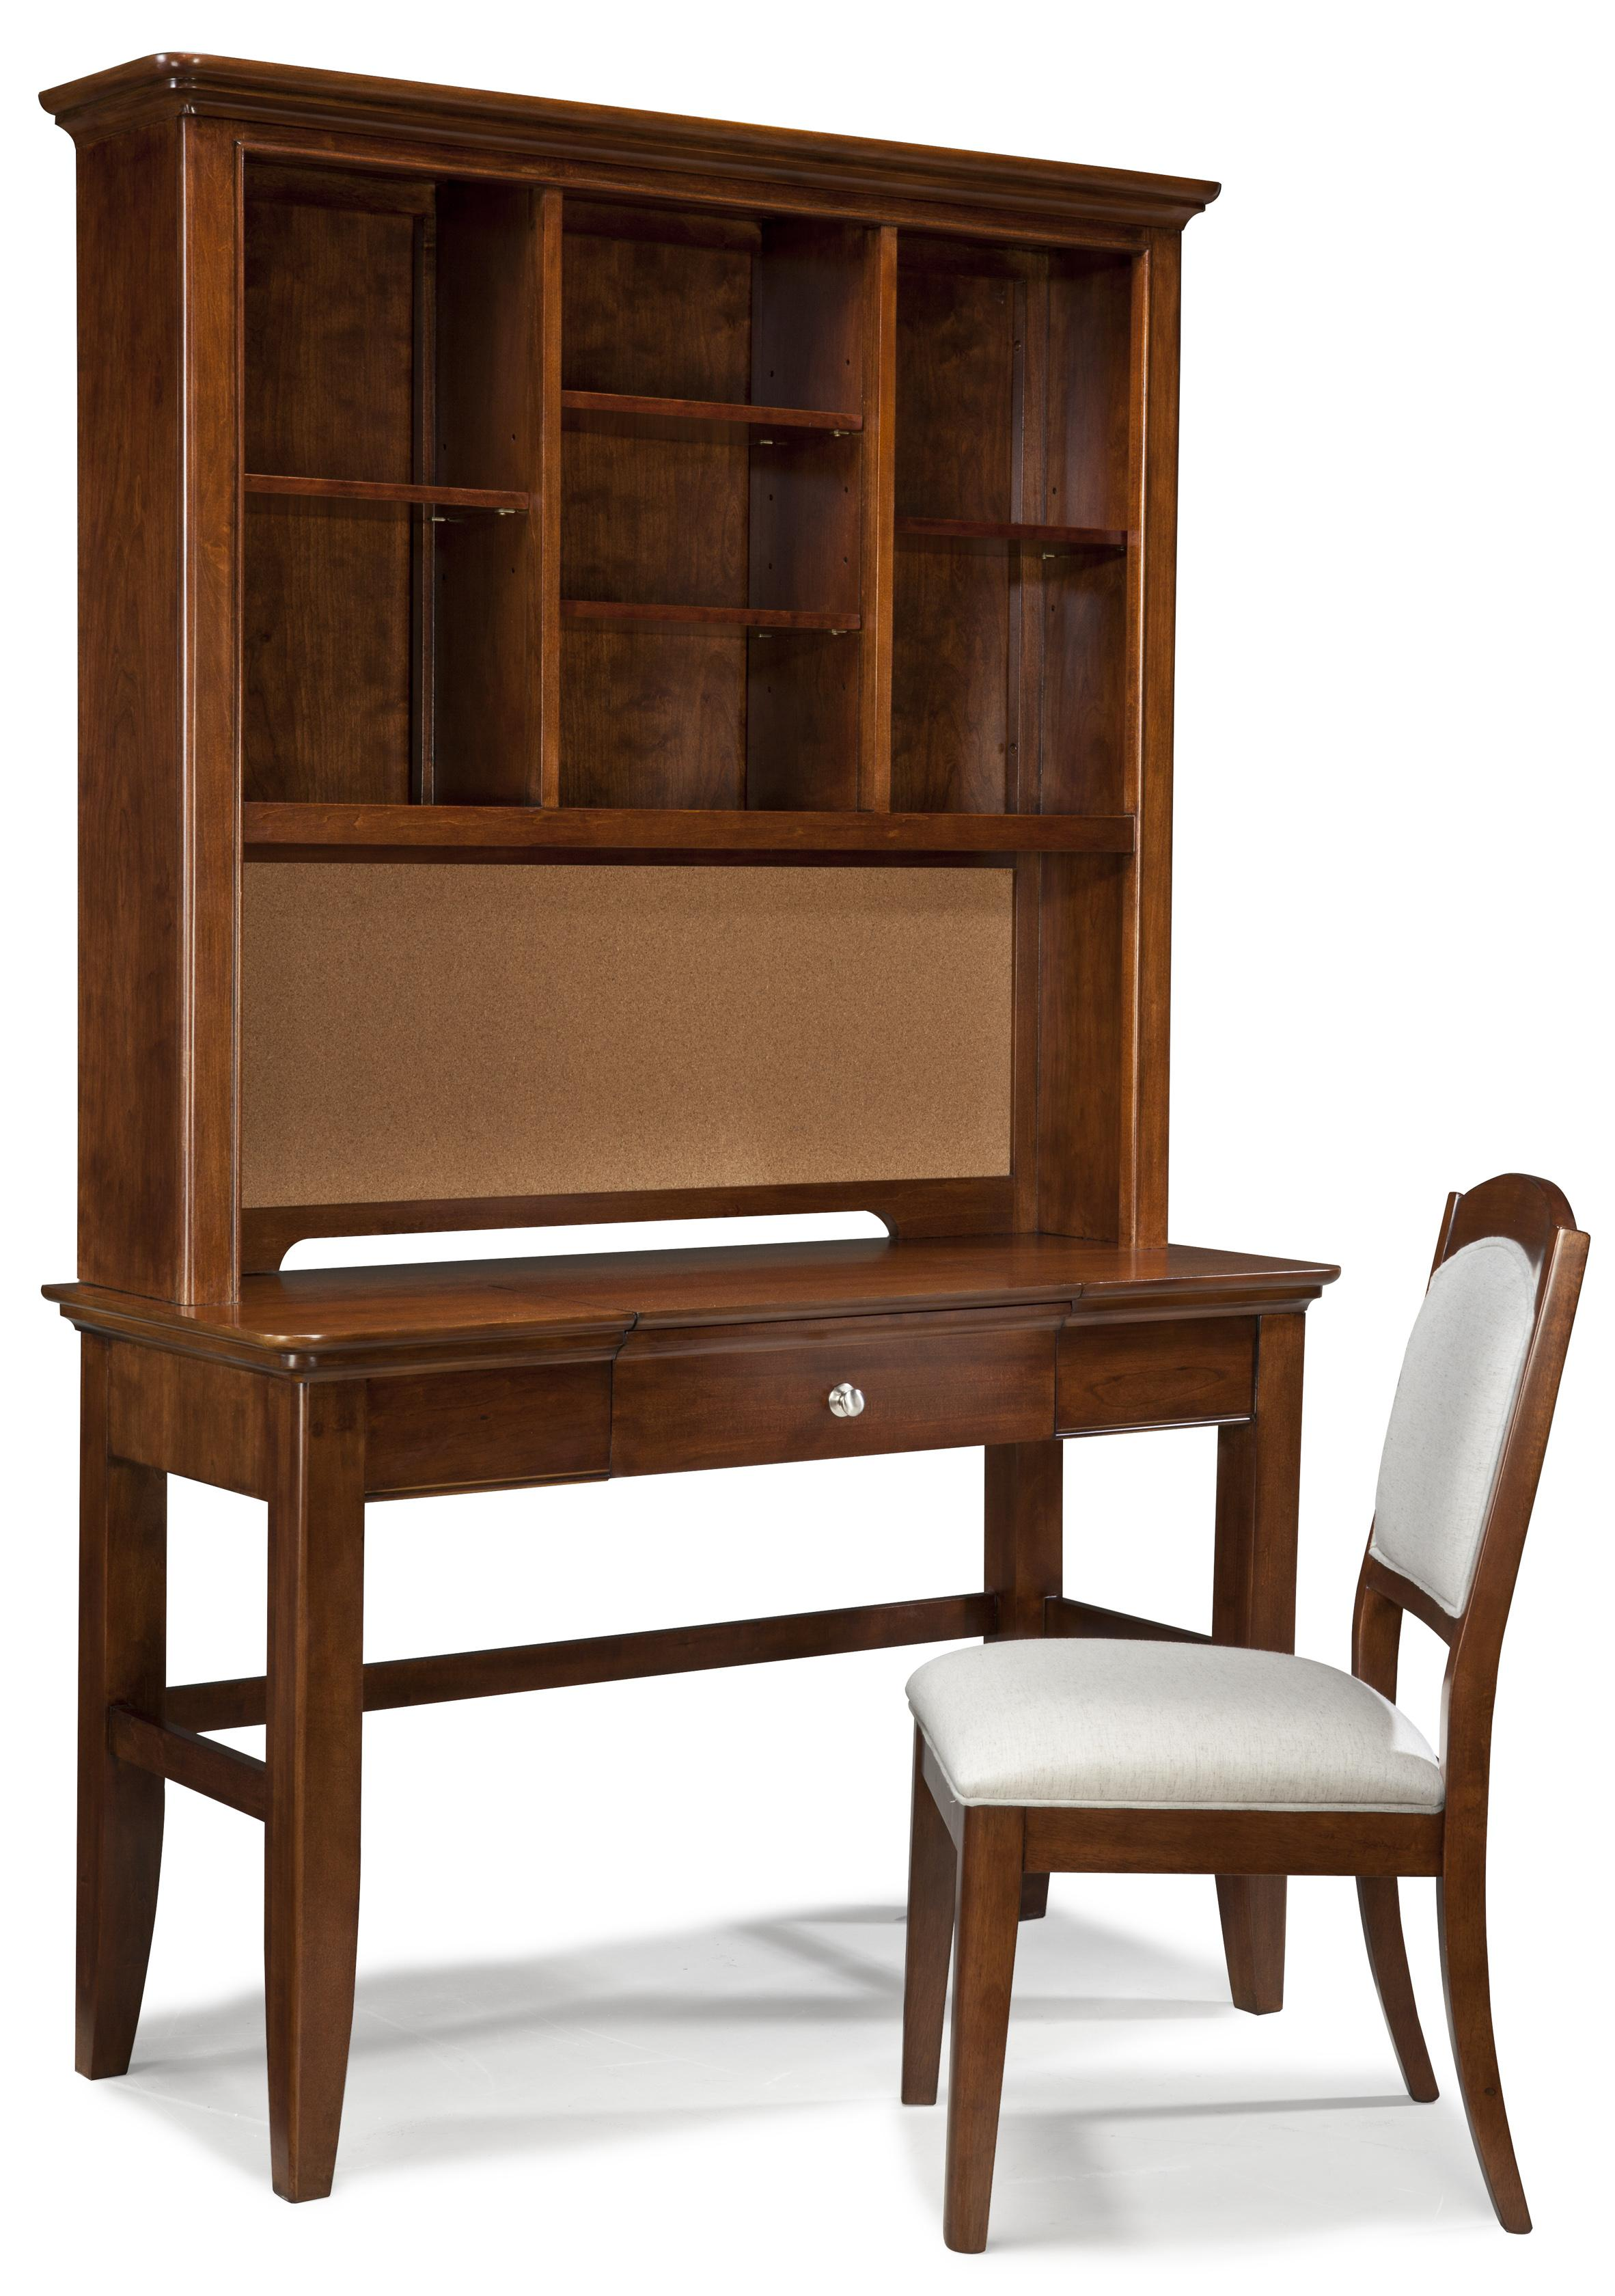 Legacy Classic Kids Impressions Desk and Hutch Set - Item Number: 2880-6100+6200